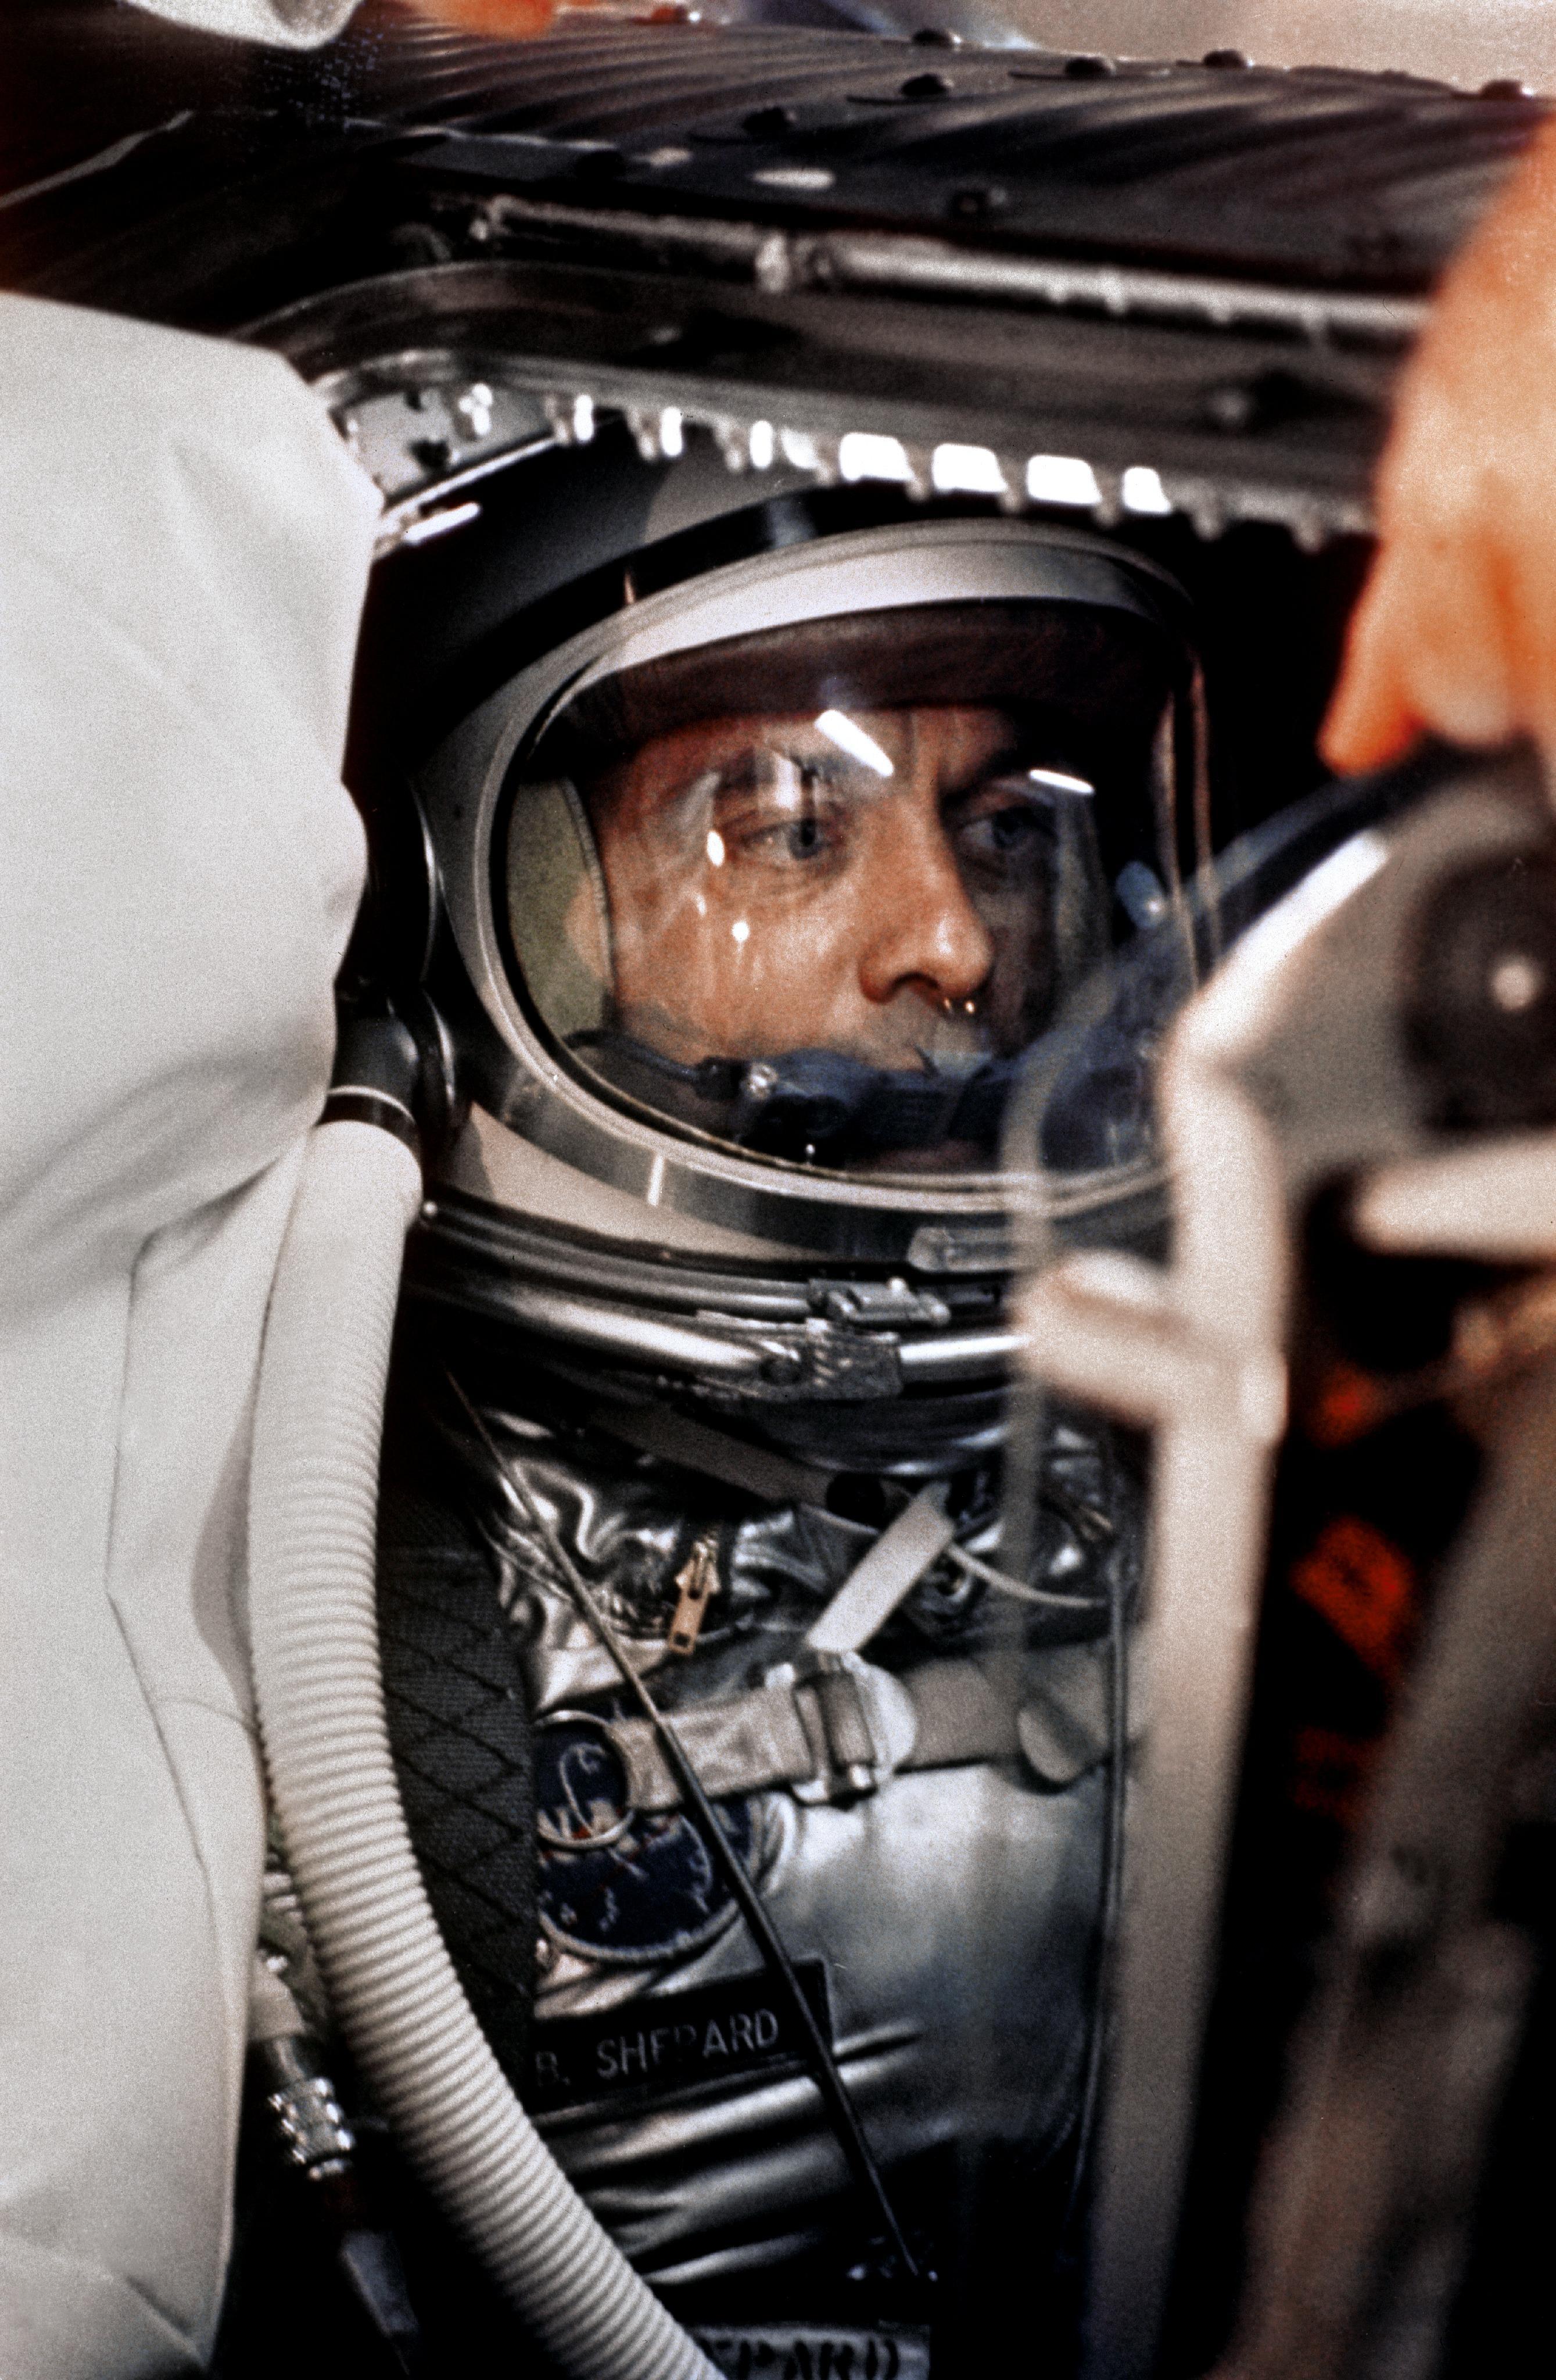 Alan_Shepard_in_capsule_aboard_Freedom_7_before_launch.jpg